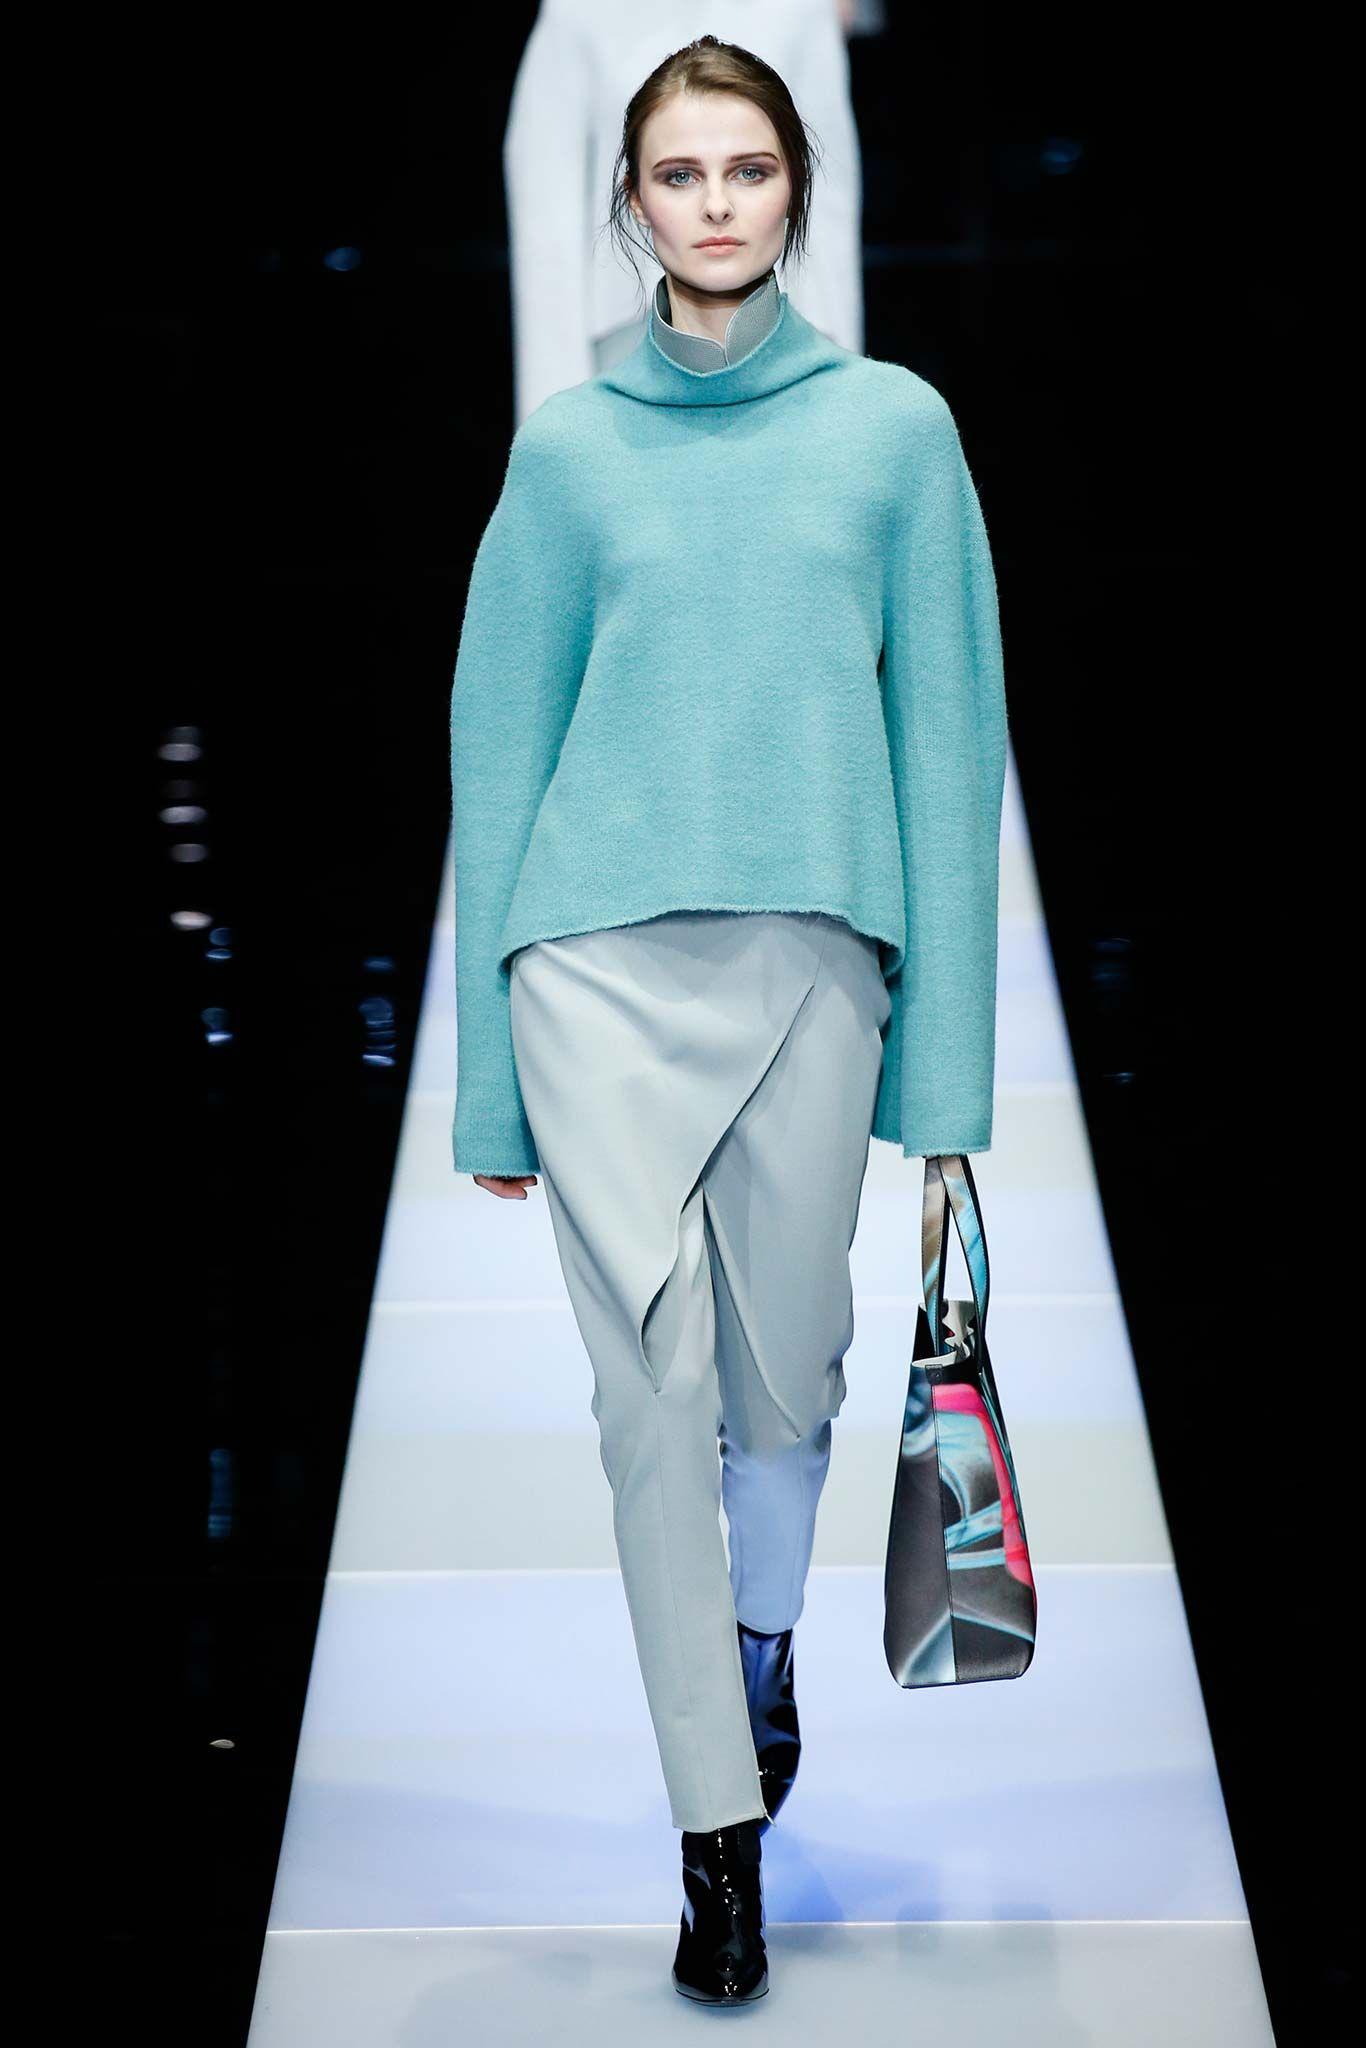 Giorgio Armani - Fall 2015 Ready-to-Wear - Look 28 of 86